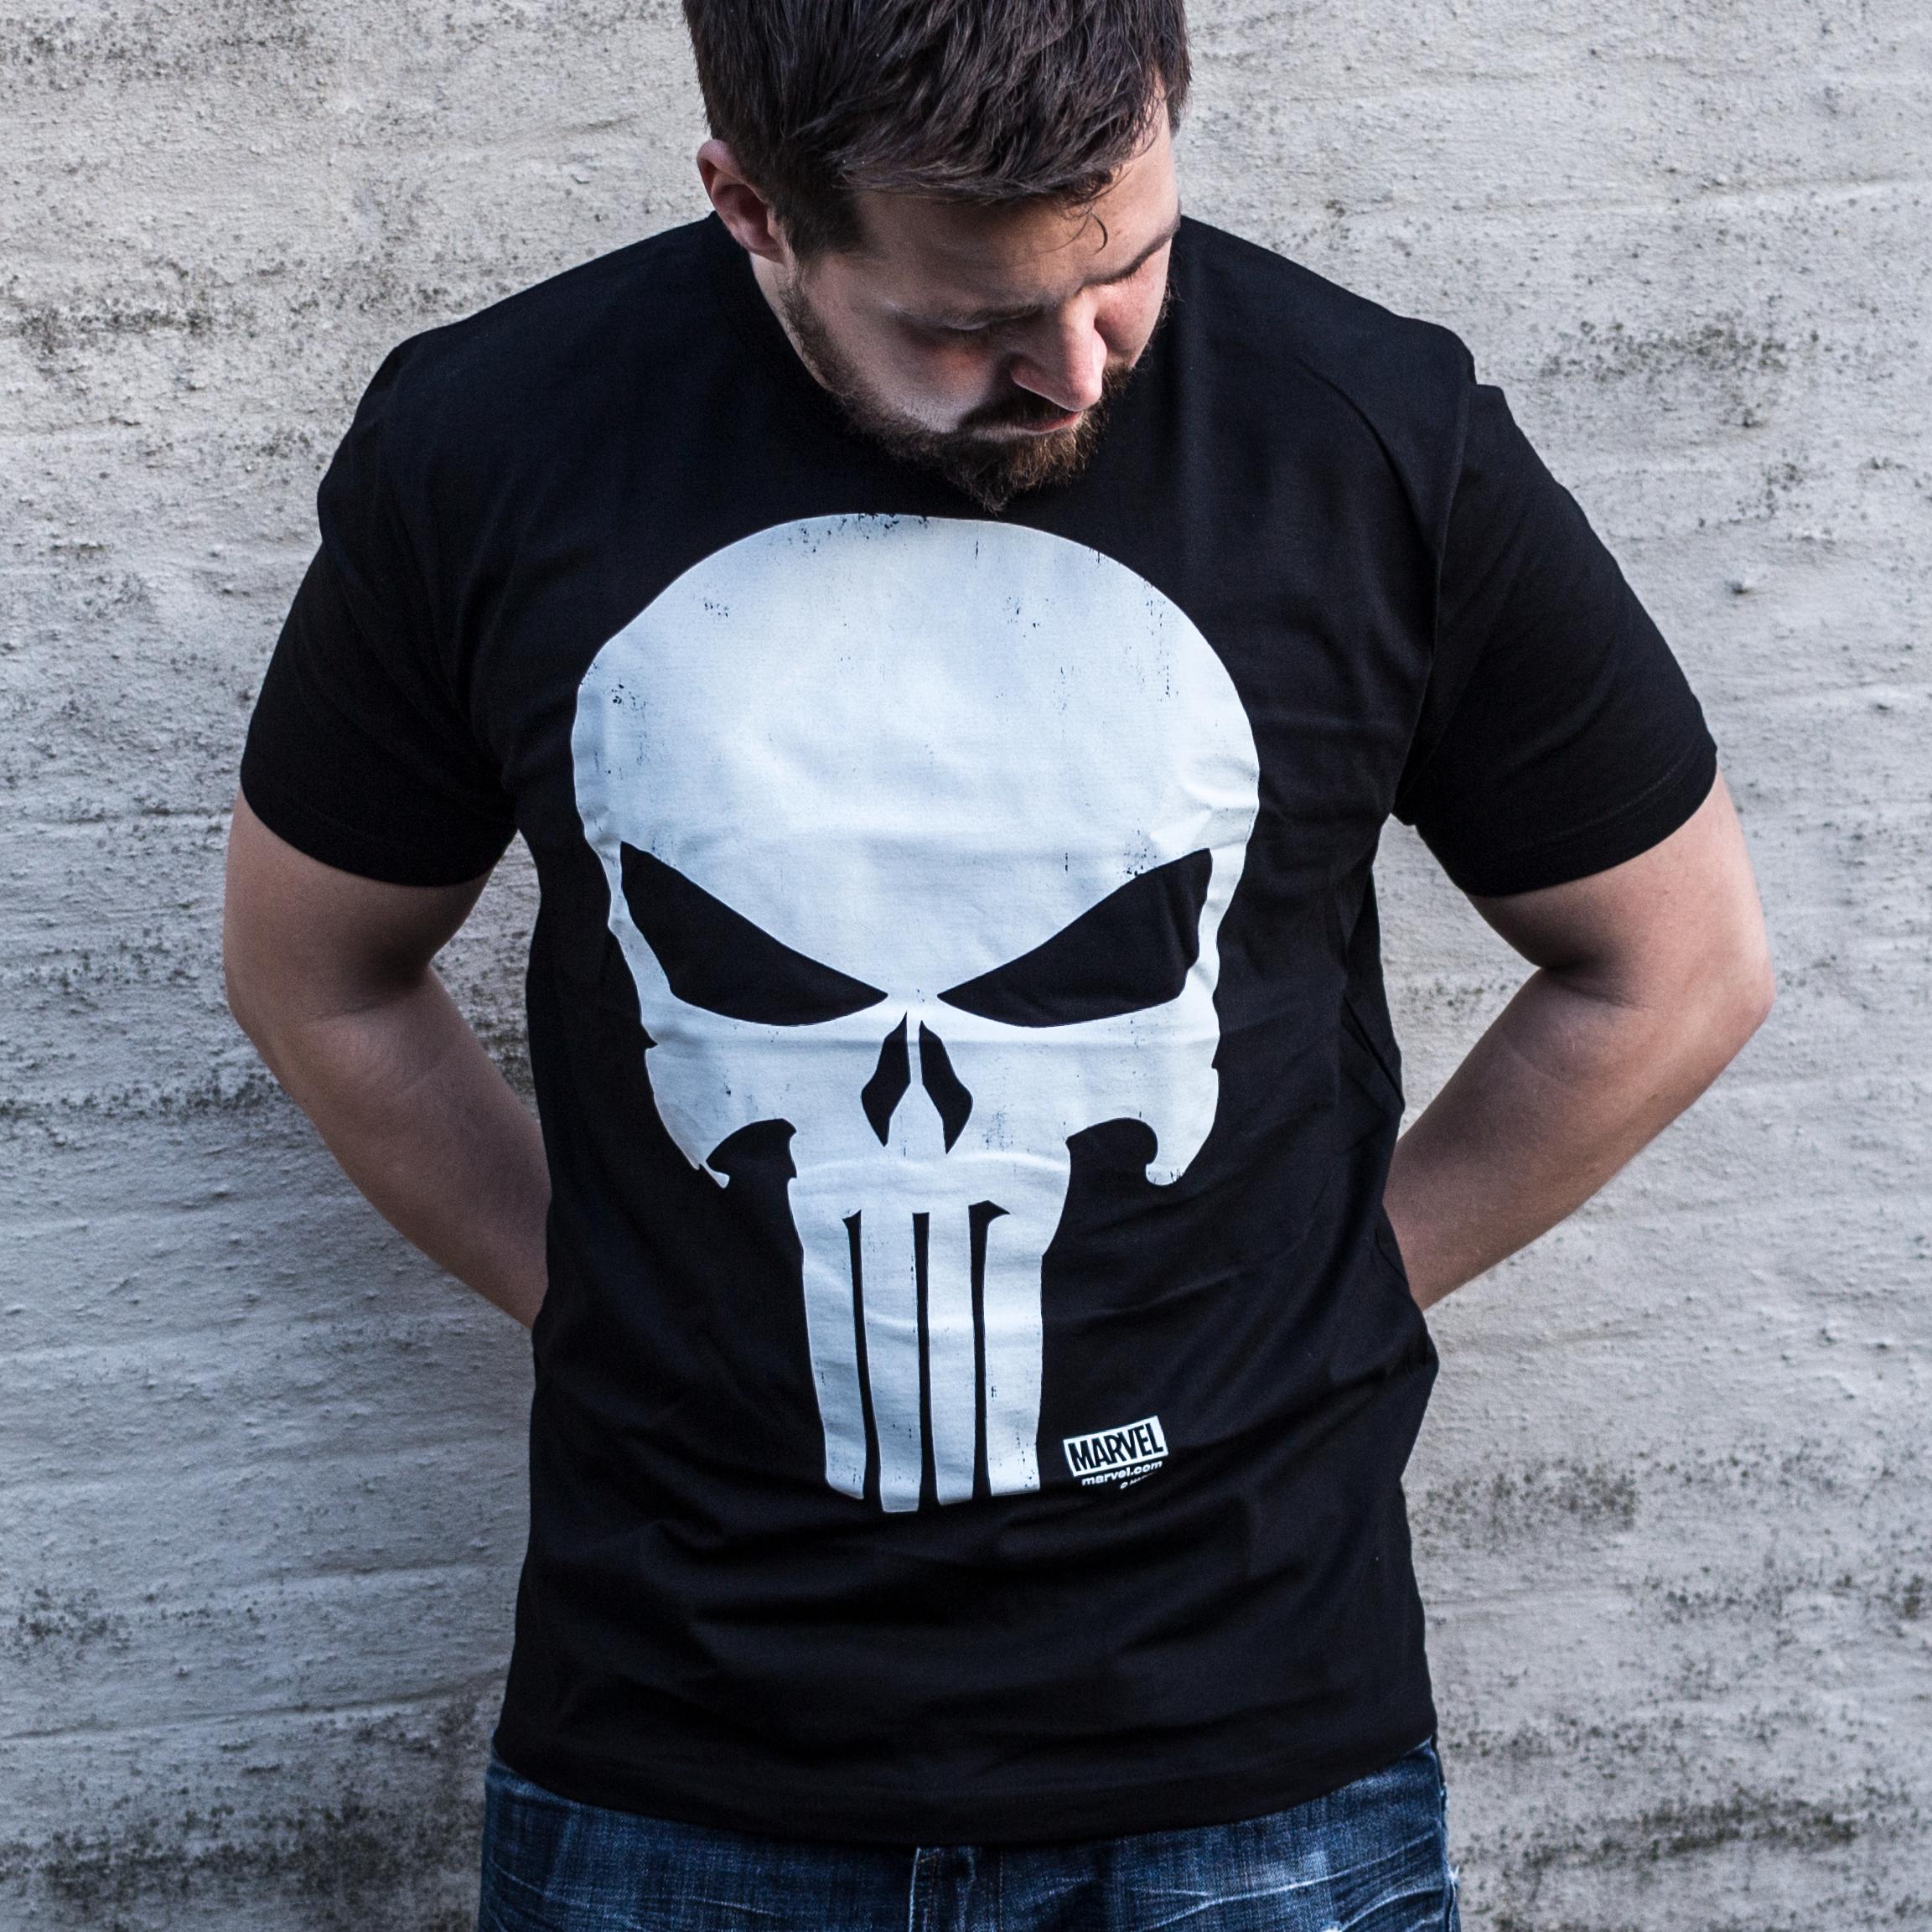 The Punisher Movie Skull T-shirt